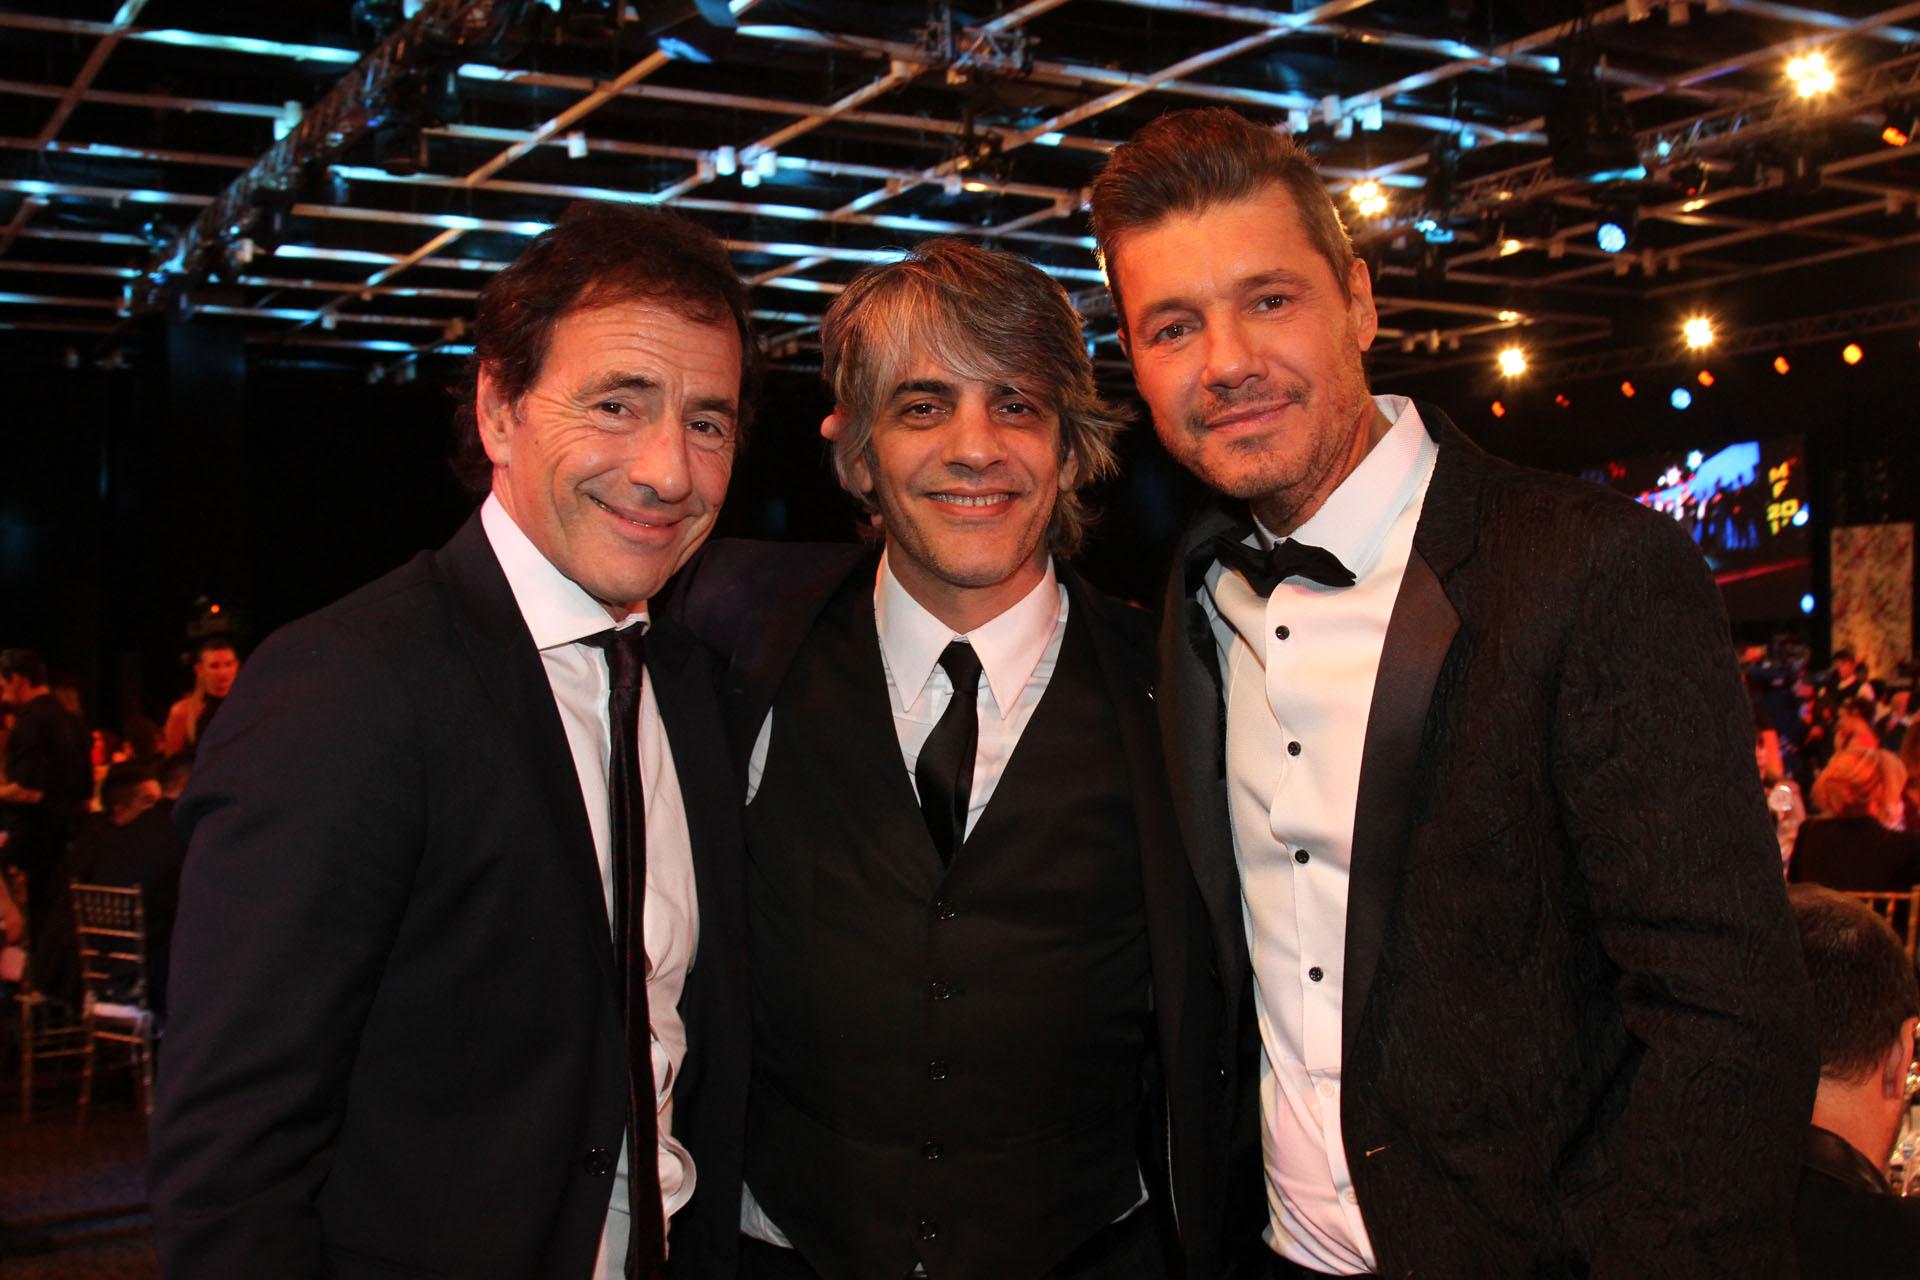 Martín Seefeld, Pablo Echarri y Marcelo Tinelli